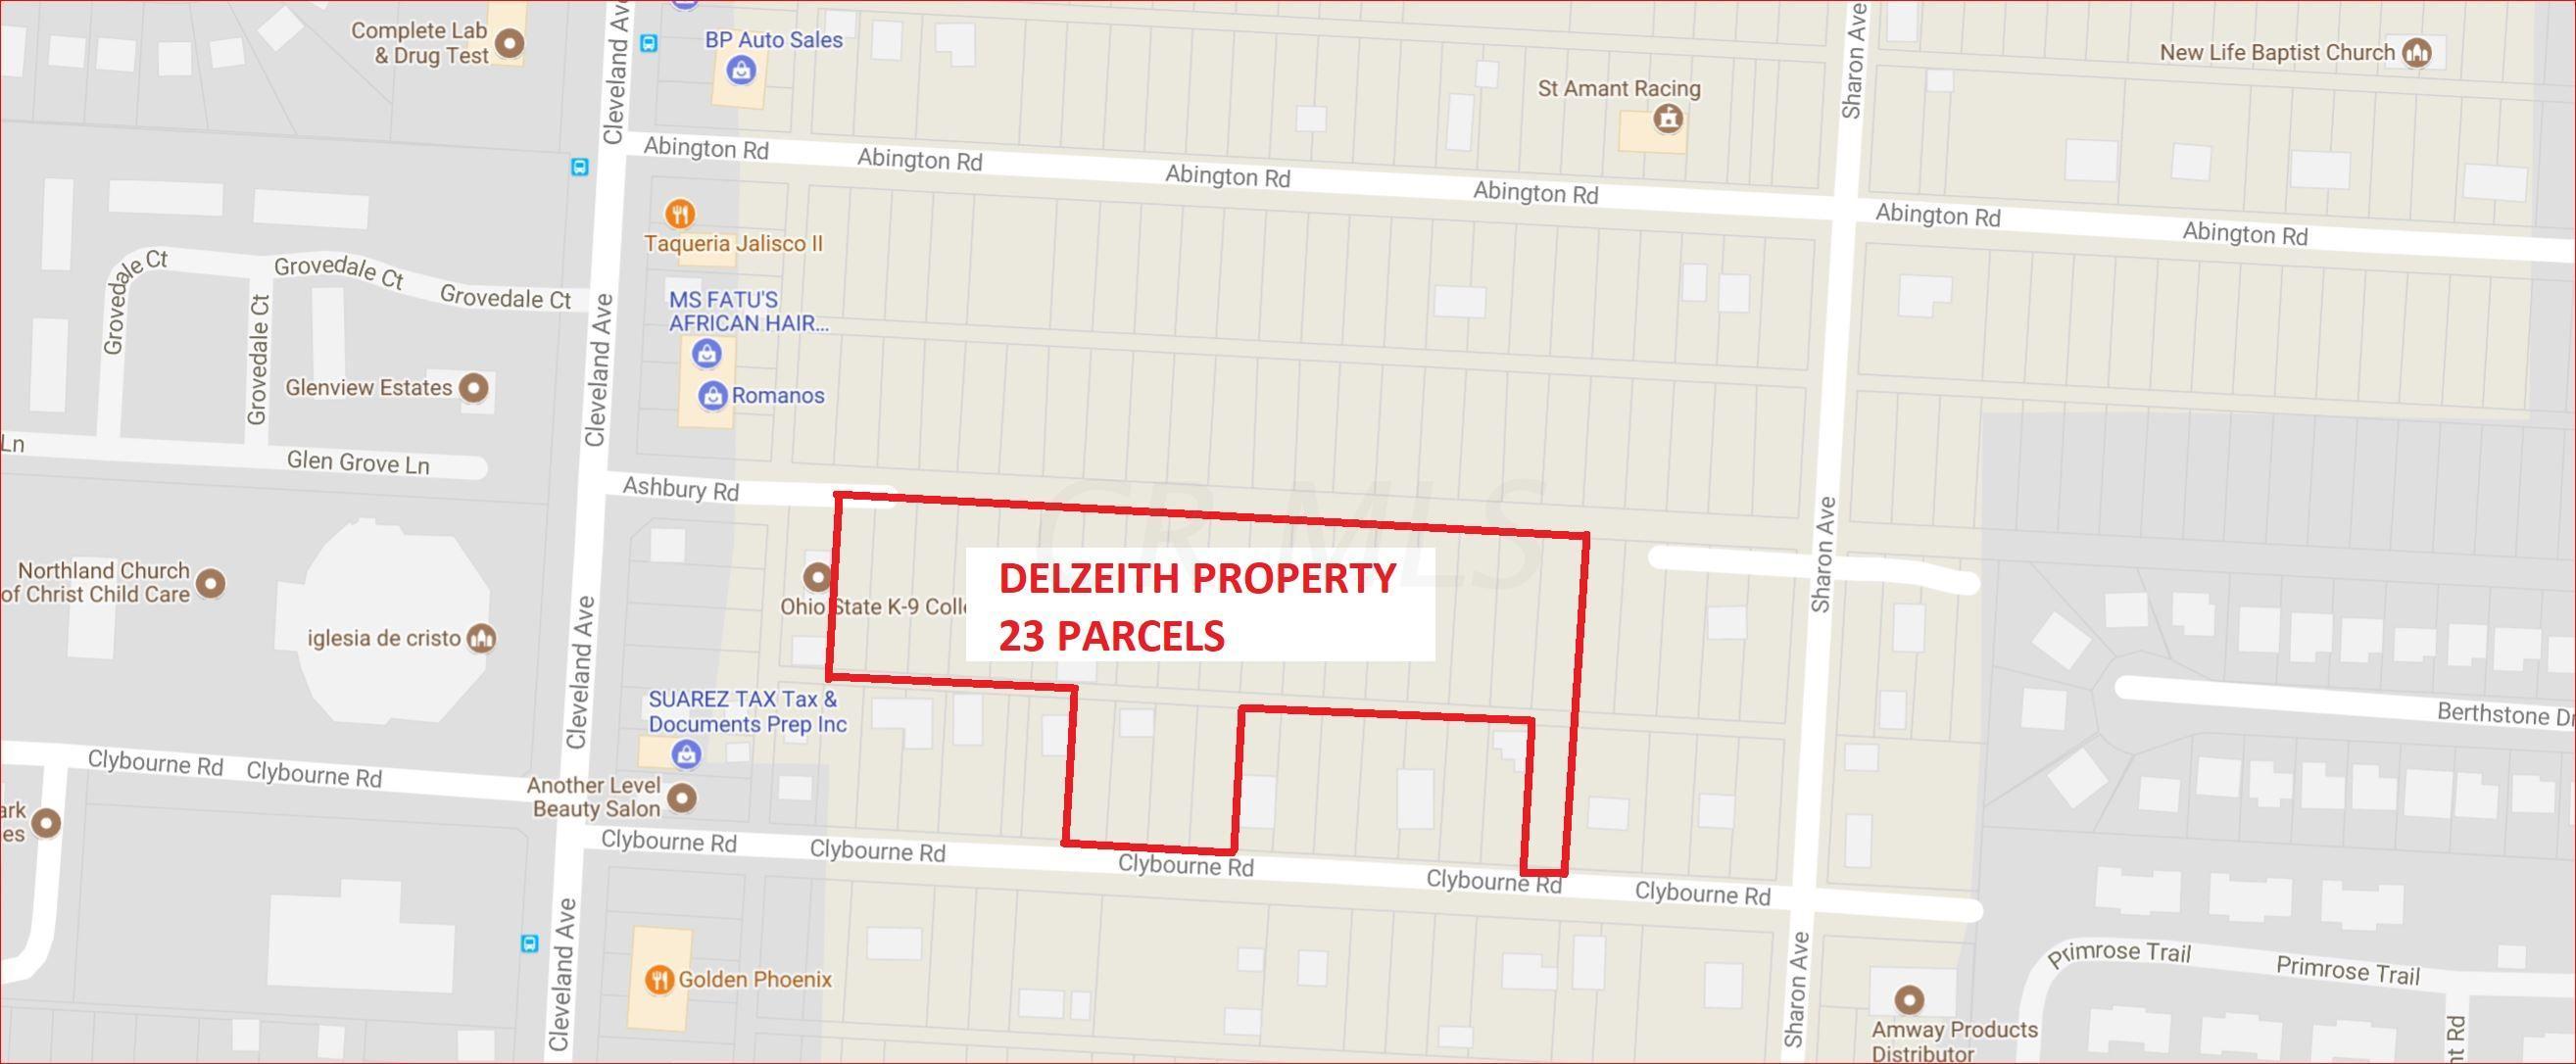 Clybourne & Ashbury Rd. MAP